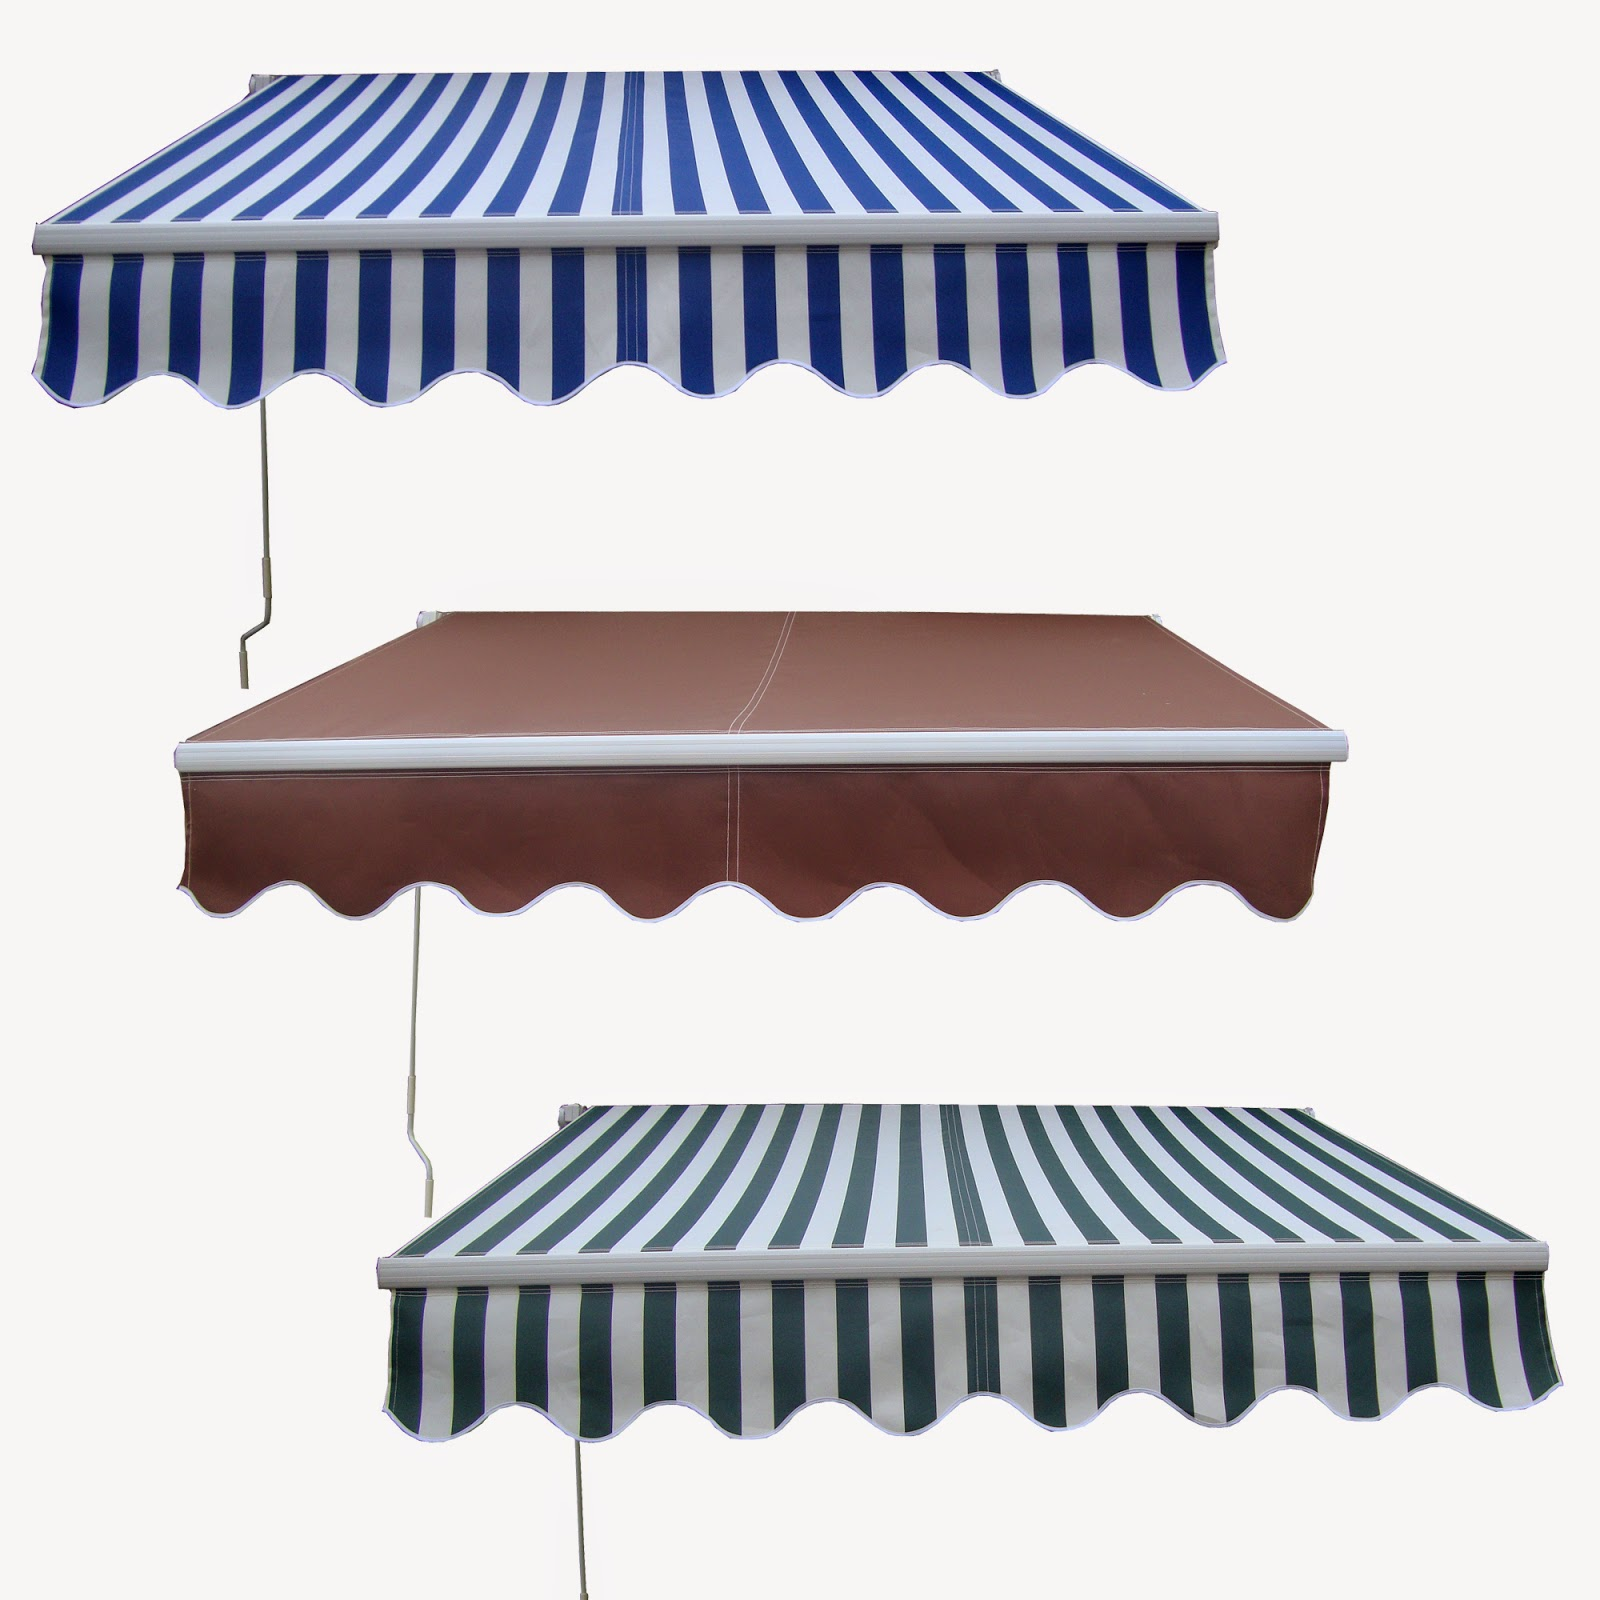 awning gulung retractable fuji jaya awning. Black Bedroom Furniture Sets. Home Design Ideas